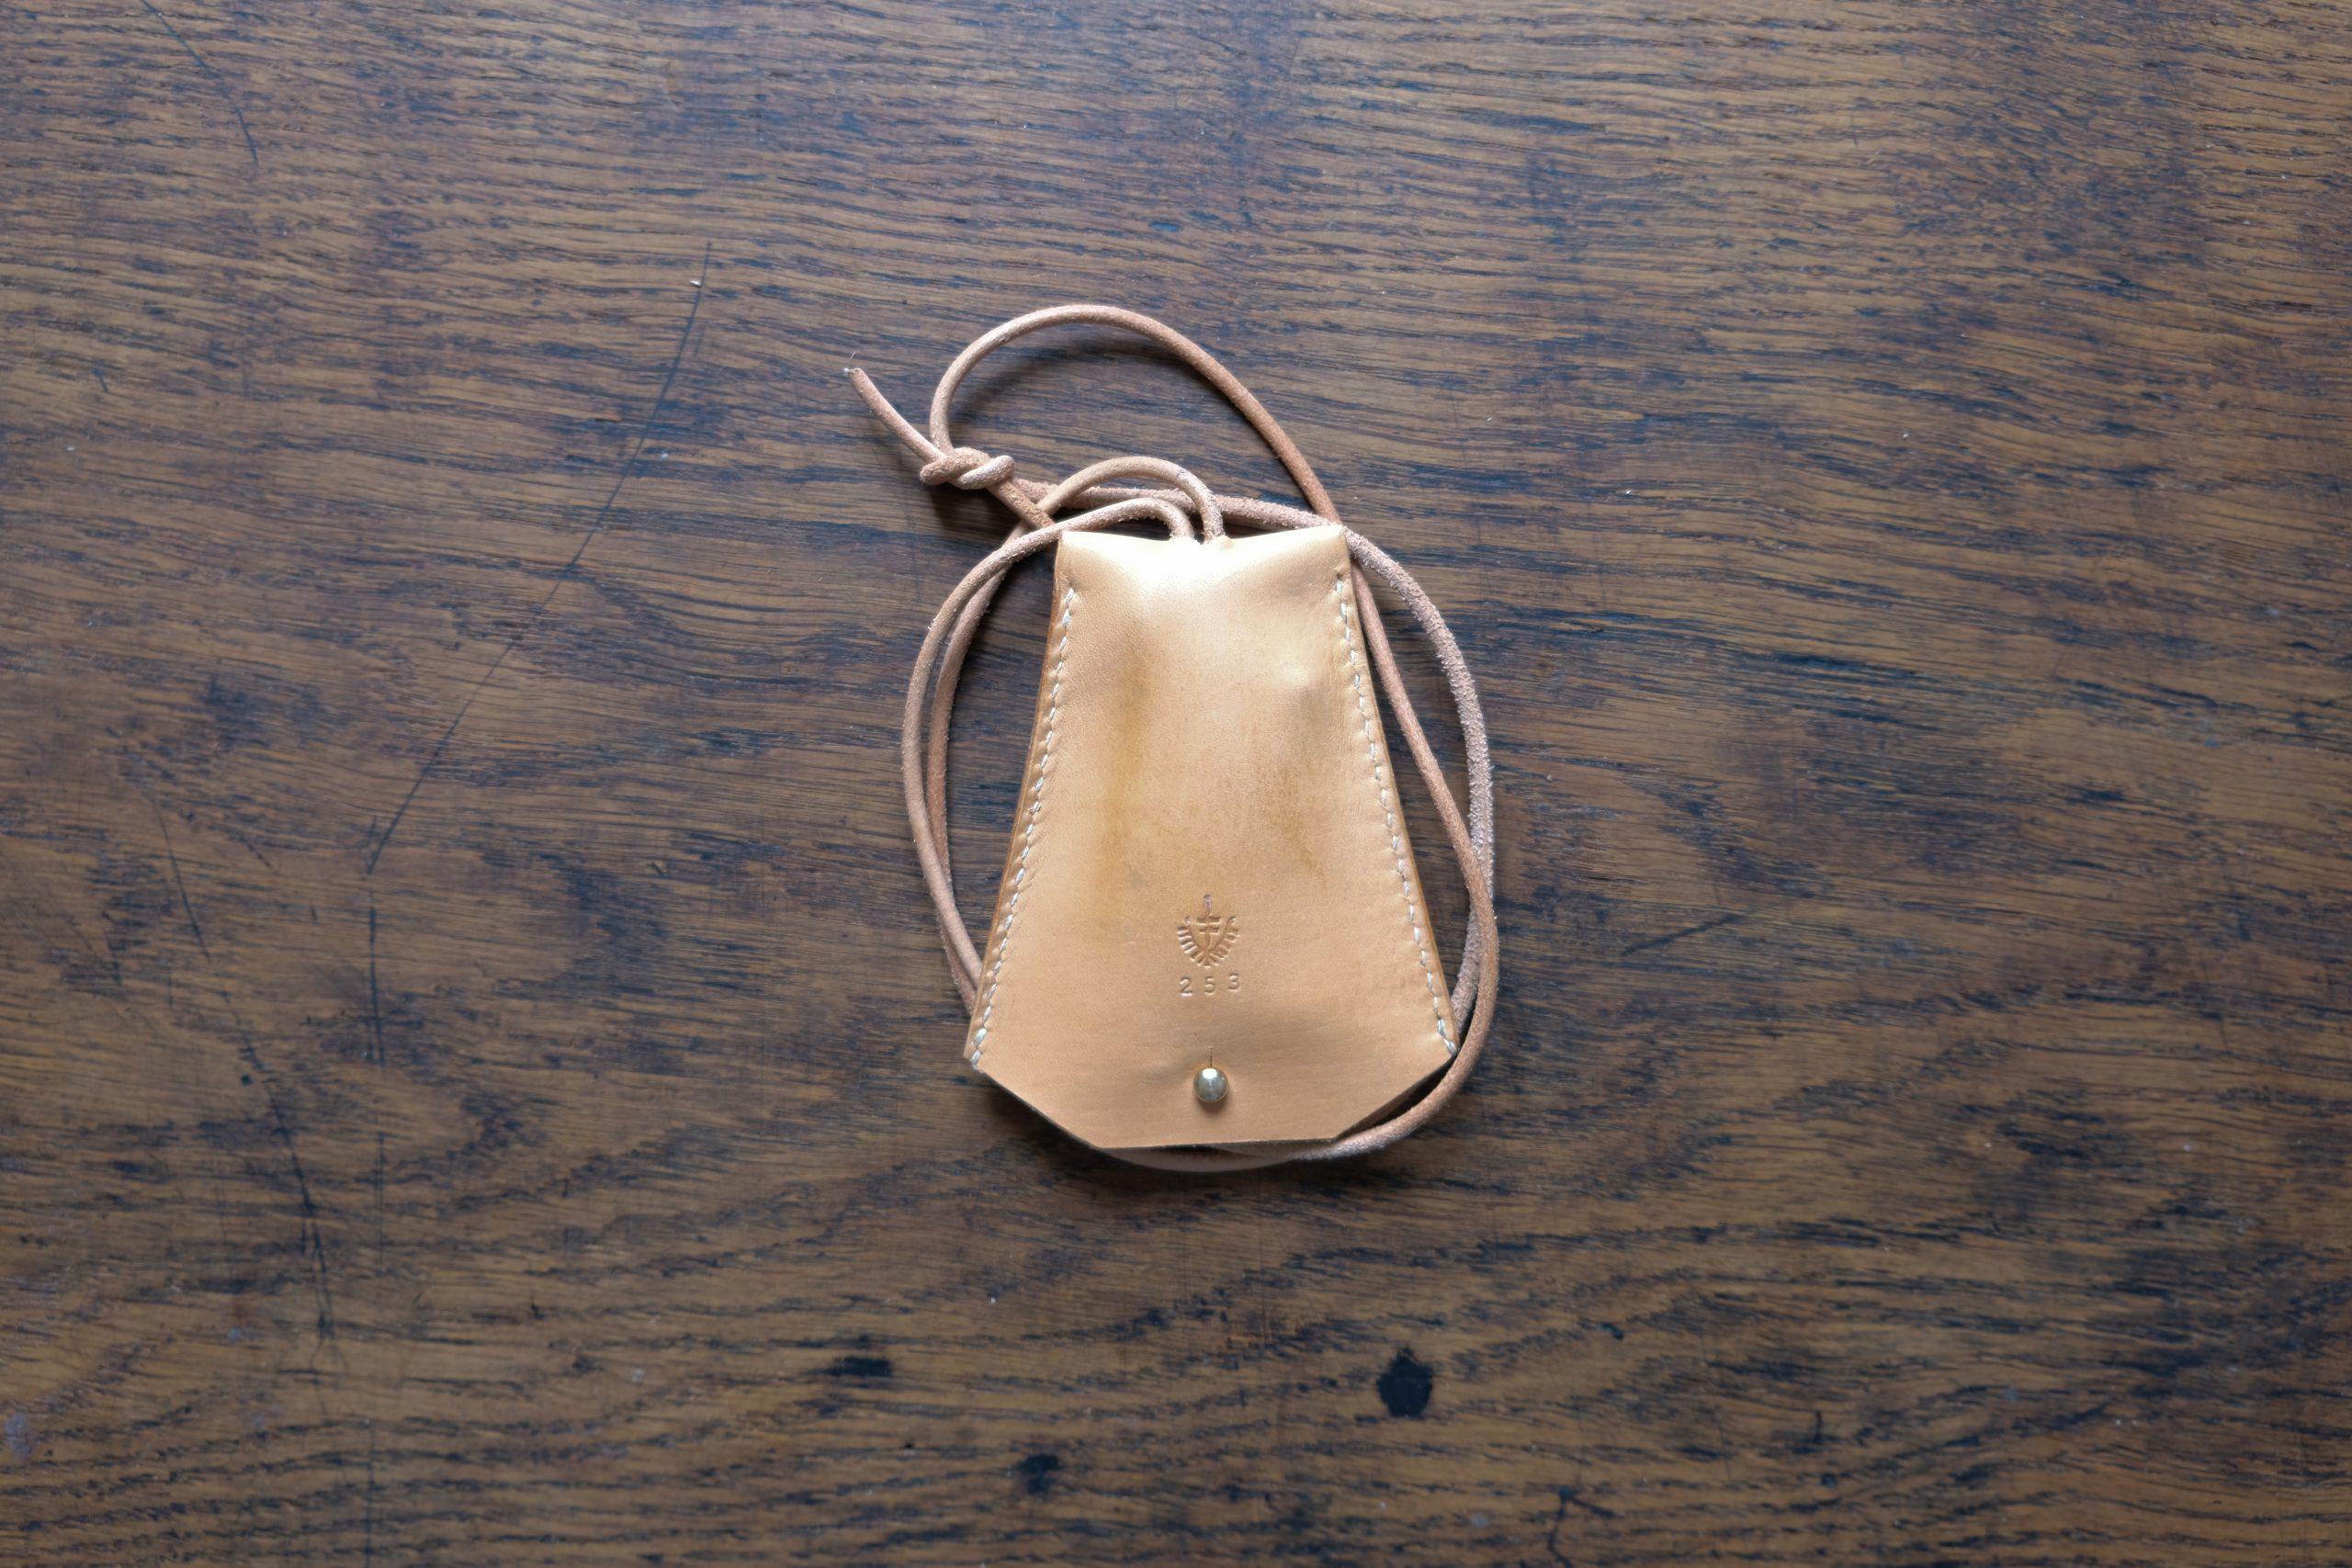 Lerif Designs leather bell key holder demo on wood background